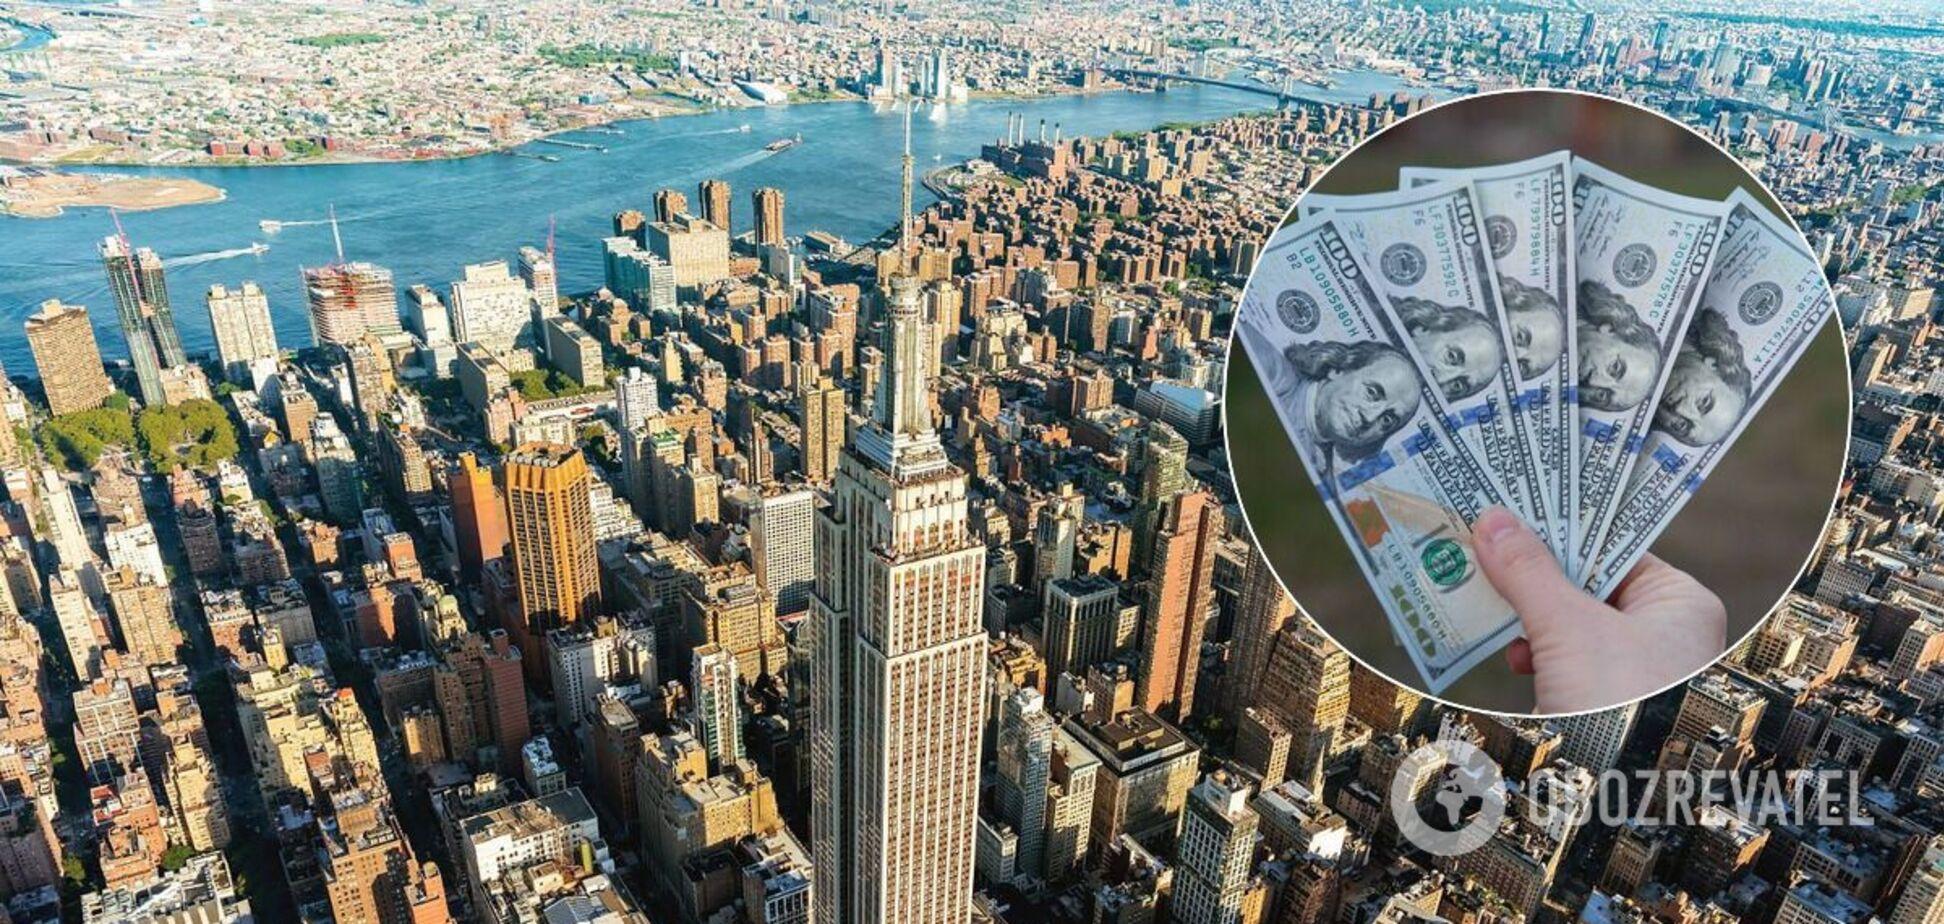 Из-за коронакризиса квартиры на Манхеттене начали сдавать бесплатно